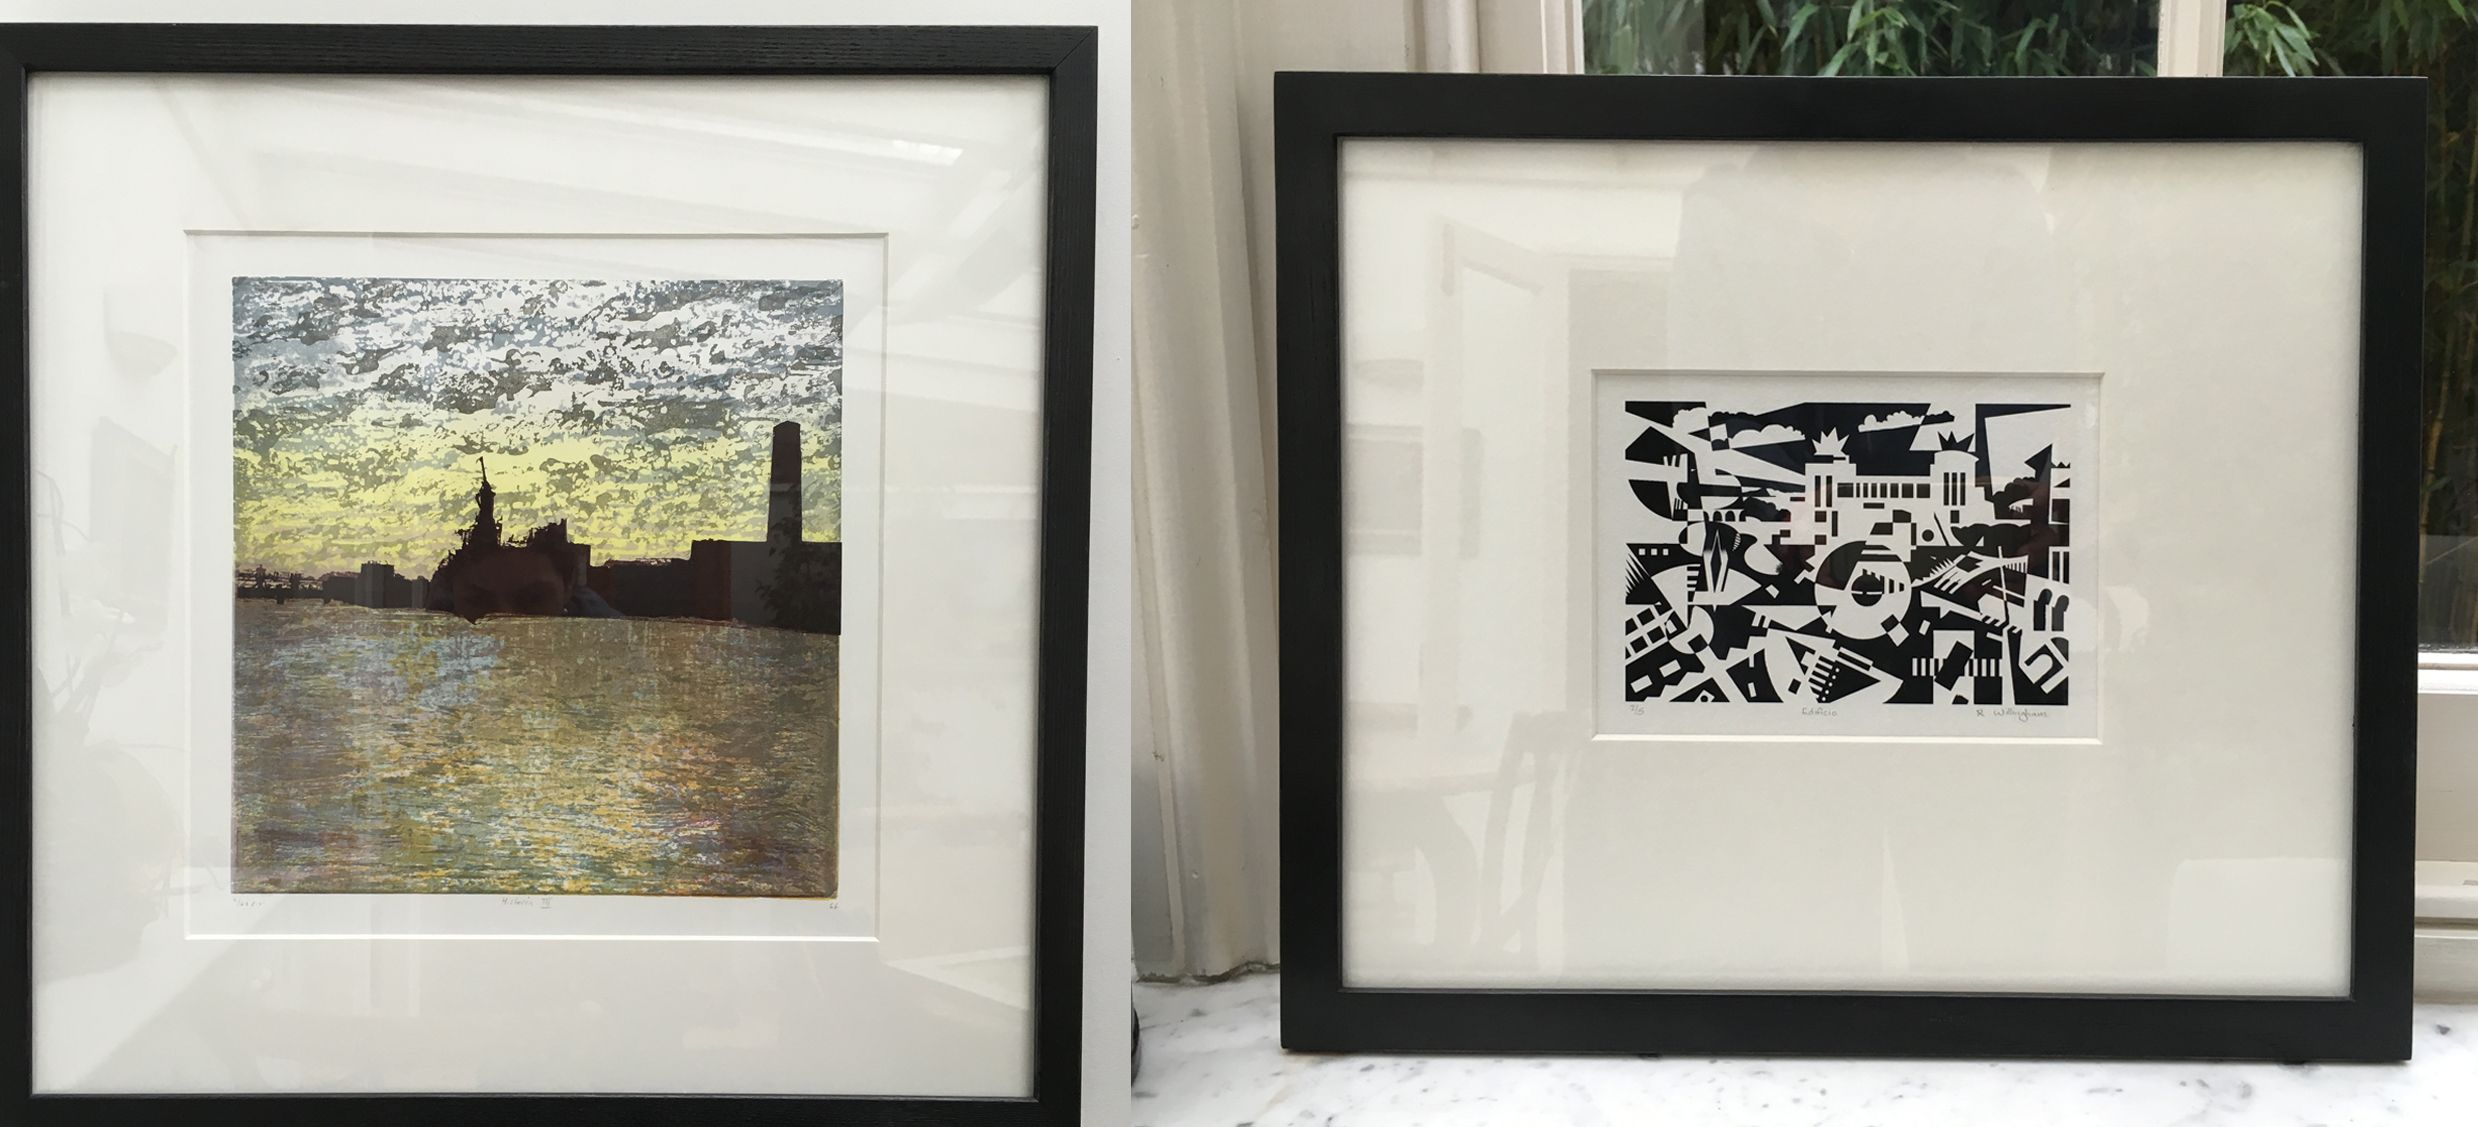 How to Frame Prints   Pinterest   Framed prints and Prints